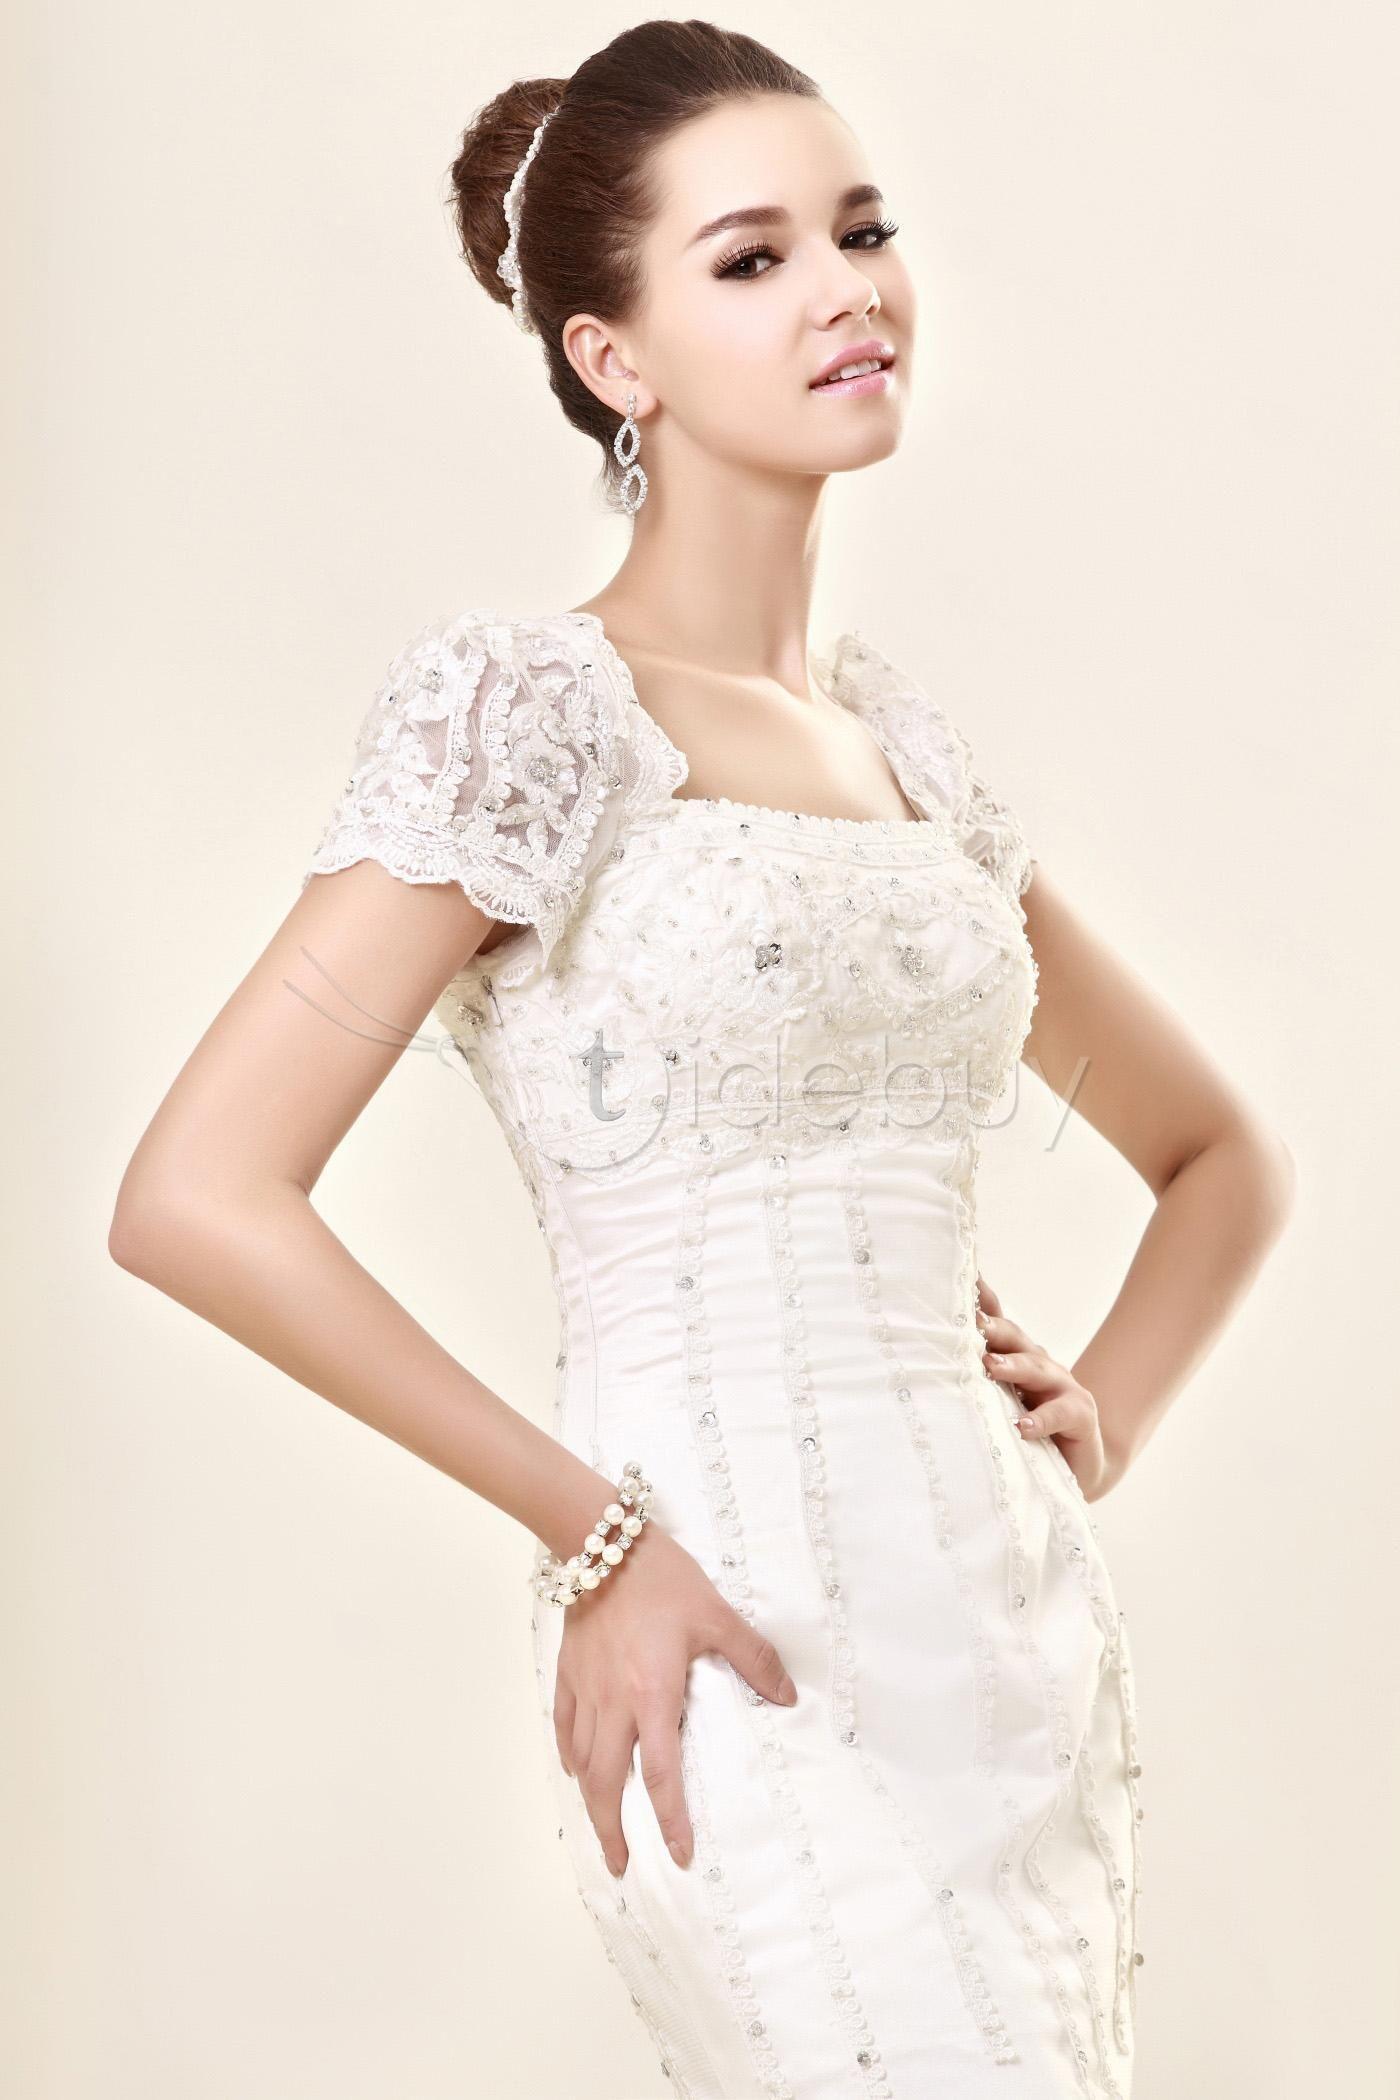 Short sleeve lace wedding dress sheathcolumn square short